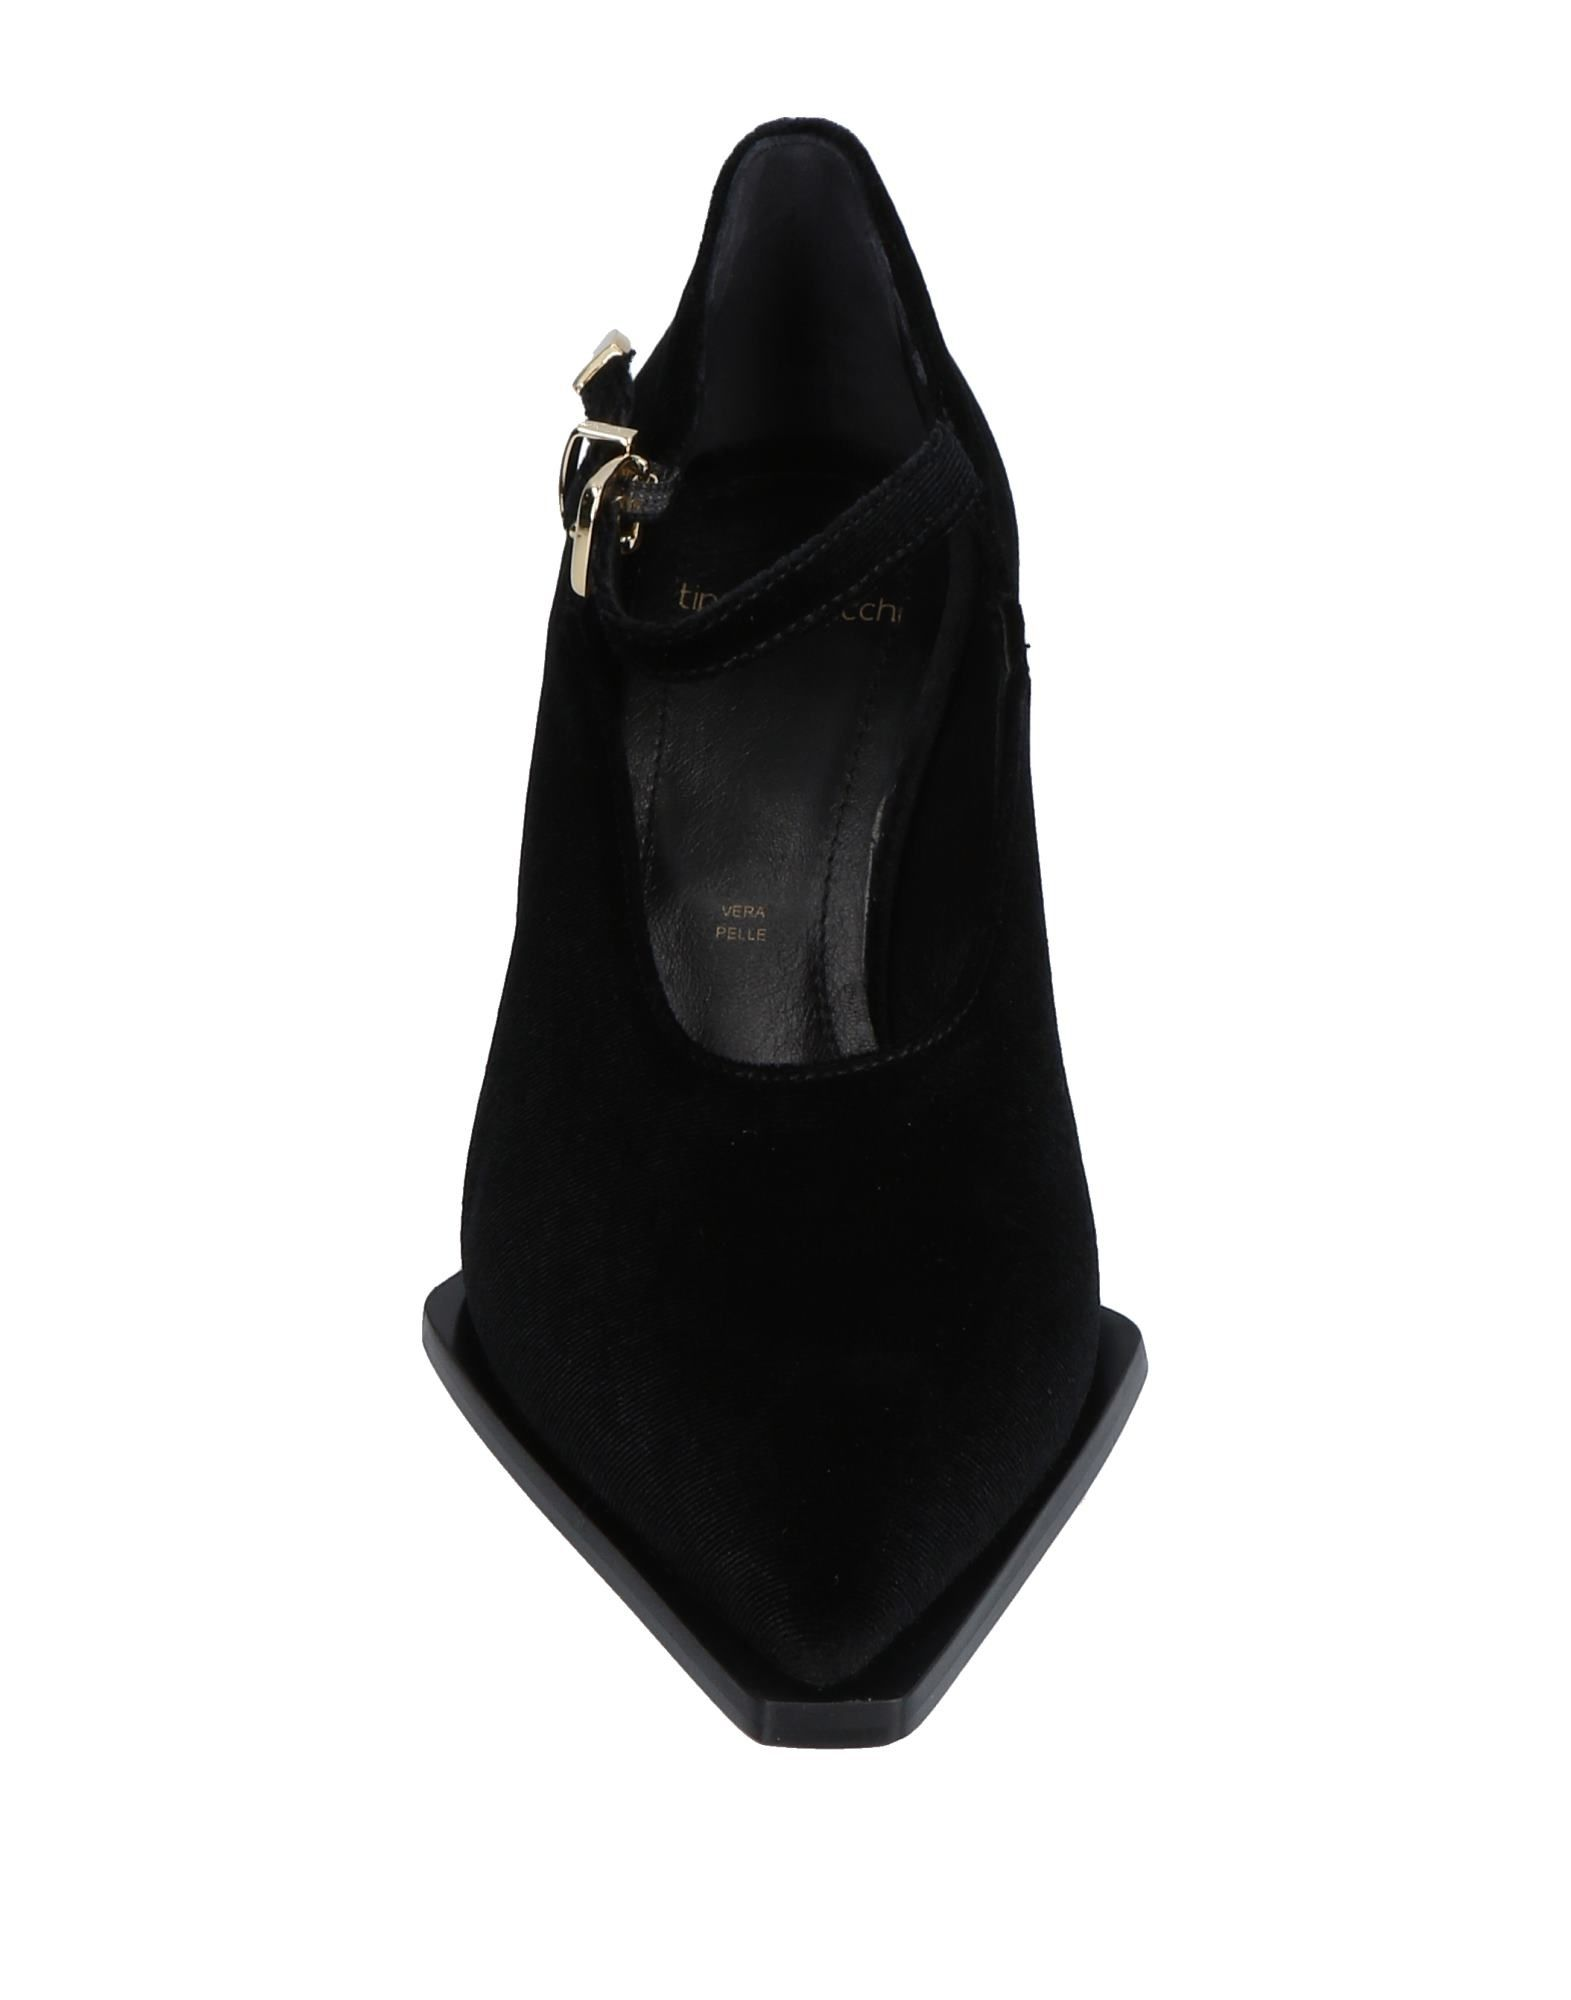 Stilvolle Tacchi billige Schuhe Tipe E Tacchi Stilvolle Pumps Damen  11448207RB 5f2cc0